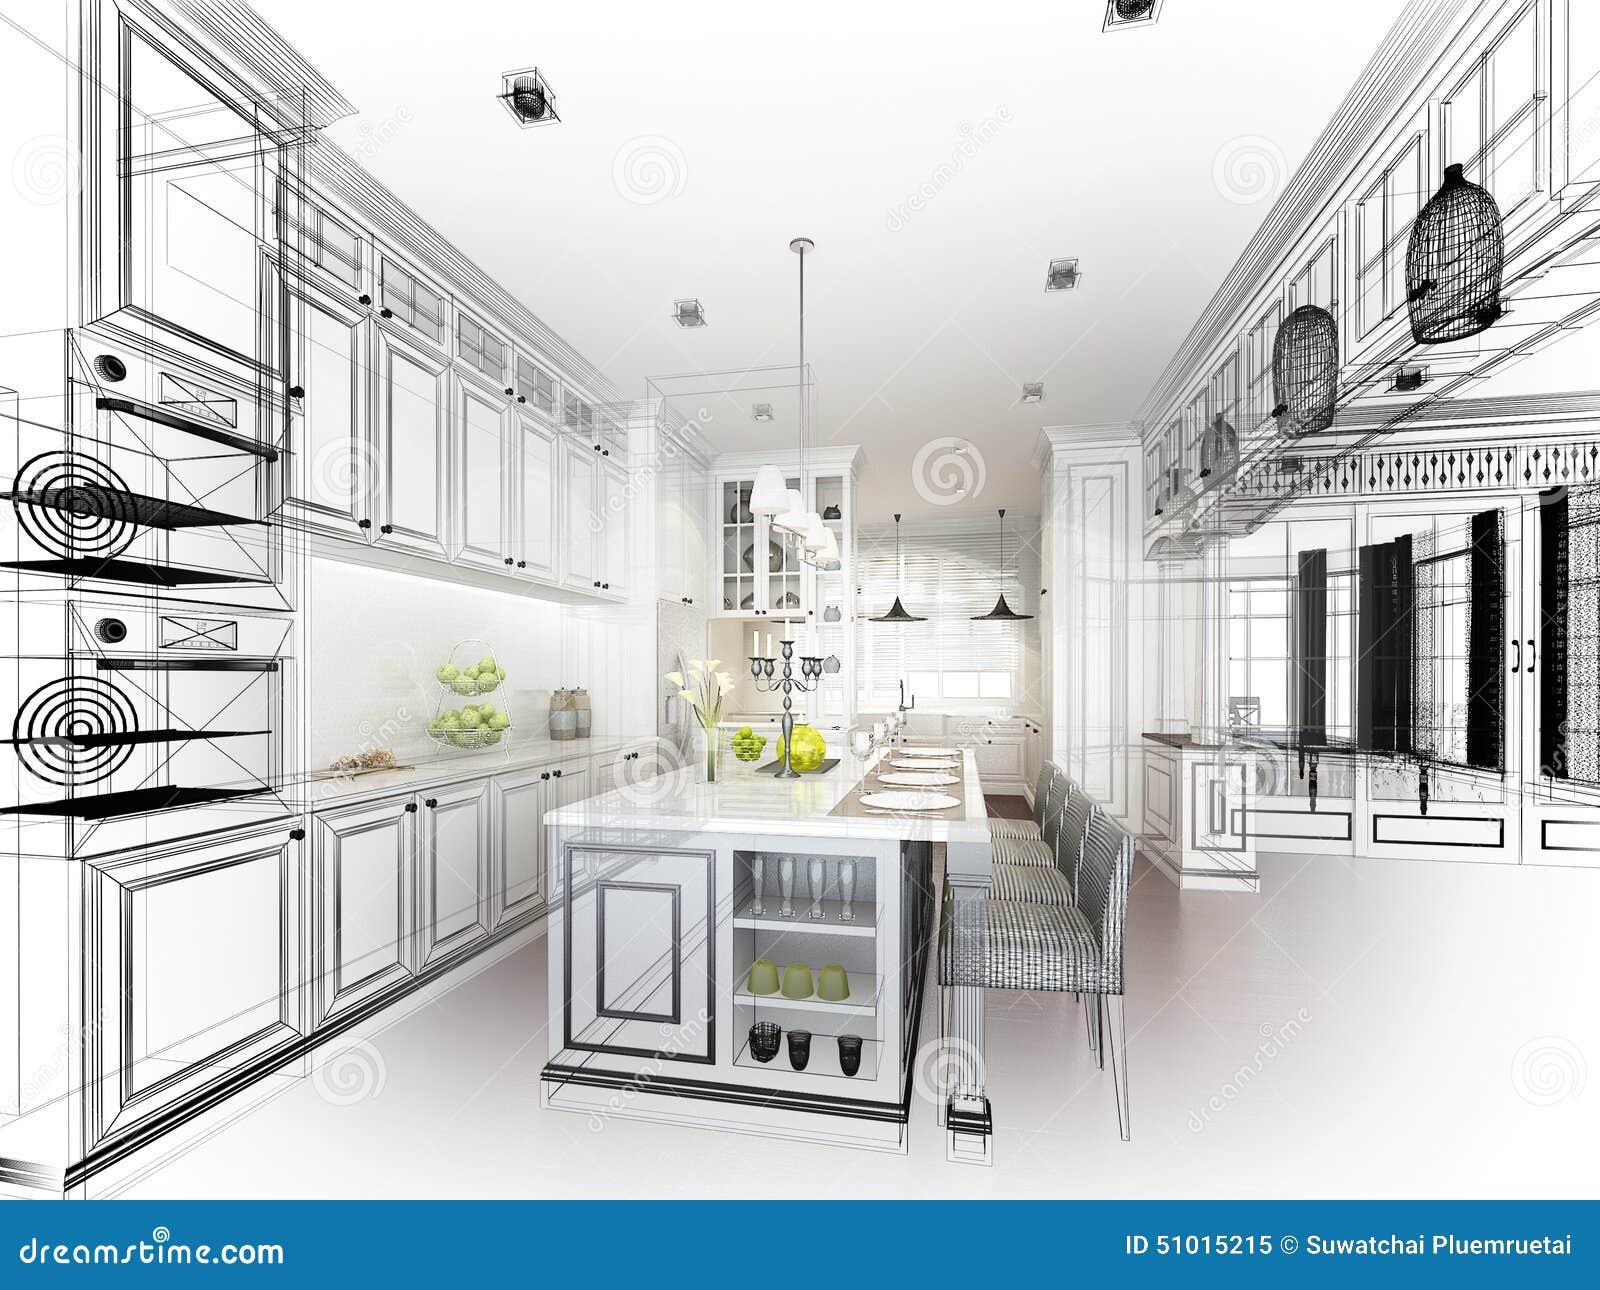 Abstract Sketch Design Interior Kitchen Stock Illustration Image